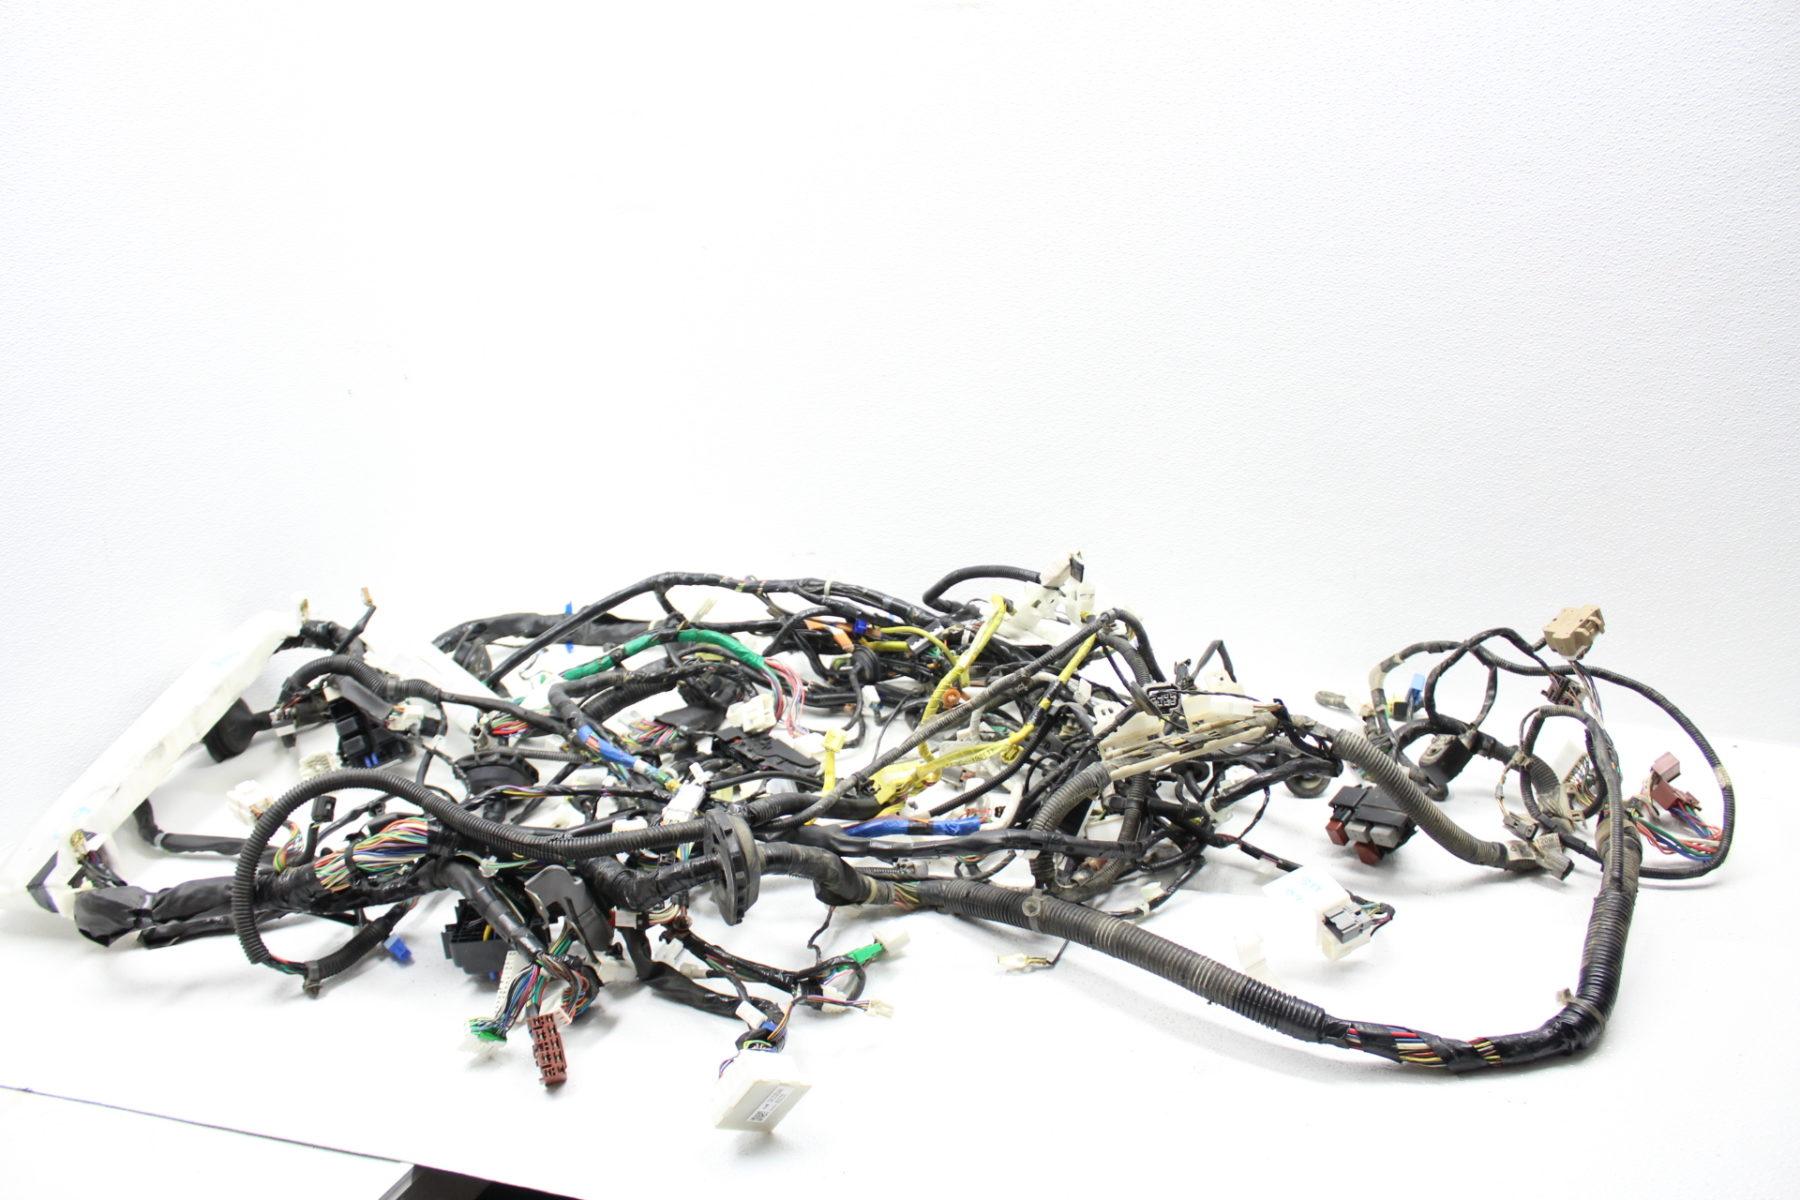 2008 2010 subaru wrx sti dashboard bulk wire wiring. Black Bedroom Furniture Sets. Home Design Ideas